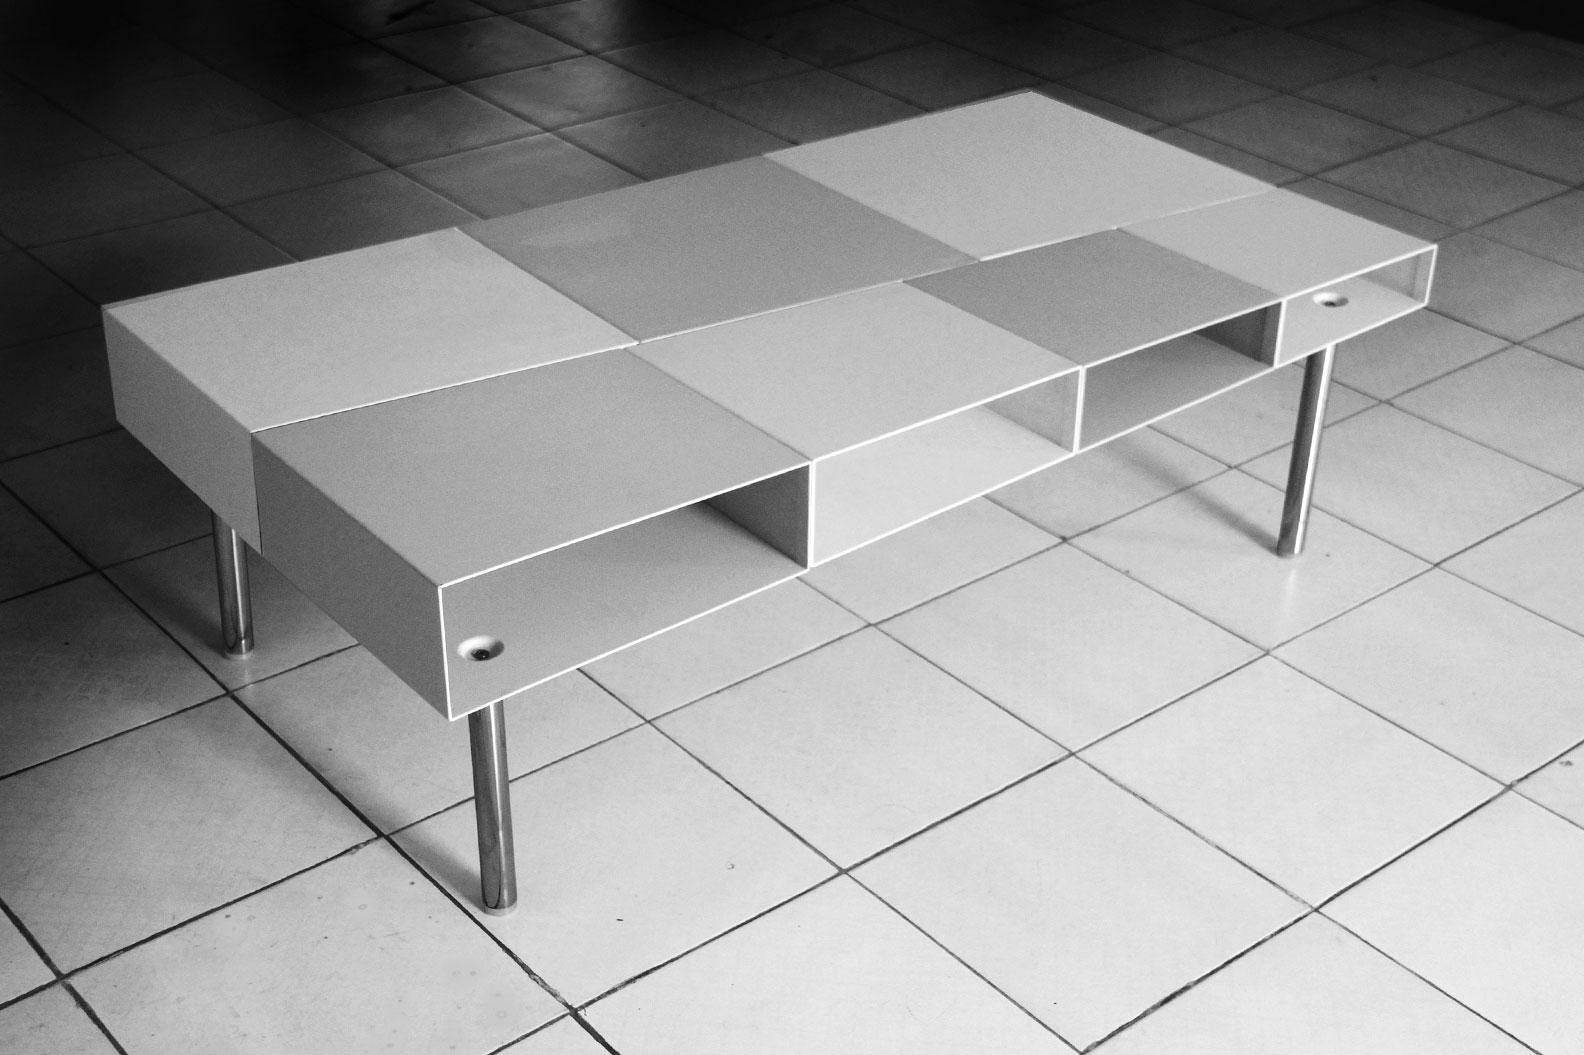 2017-Web-7-Box-table-2